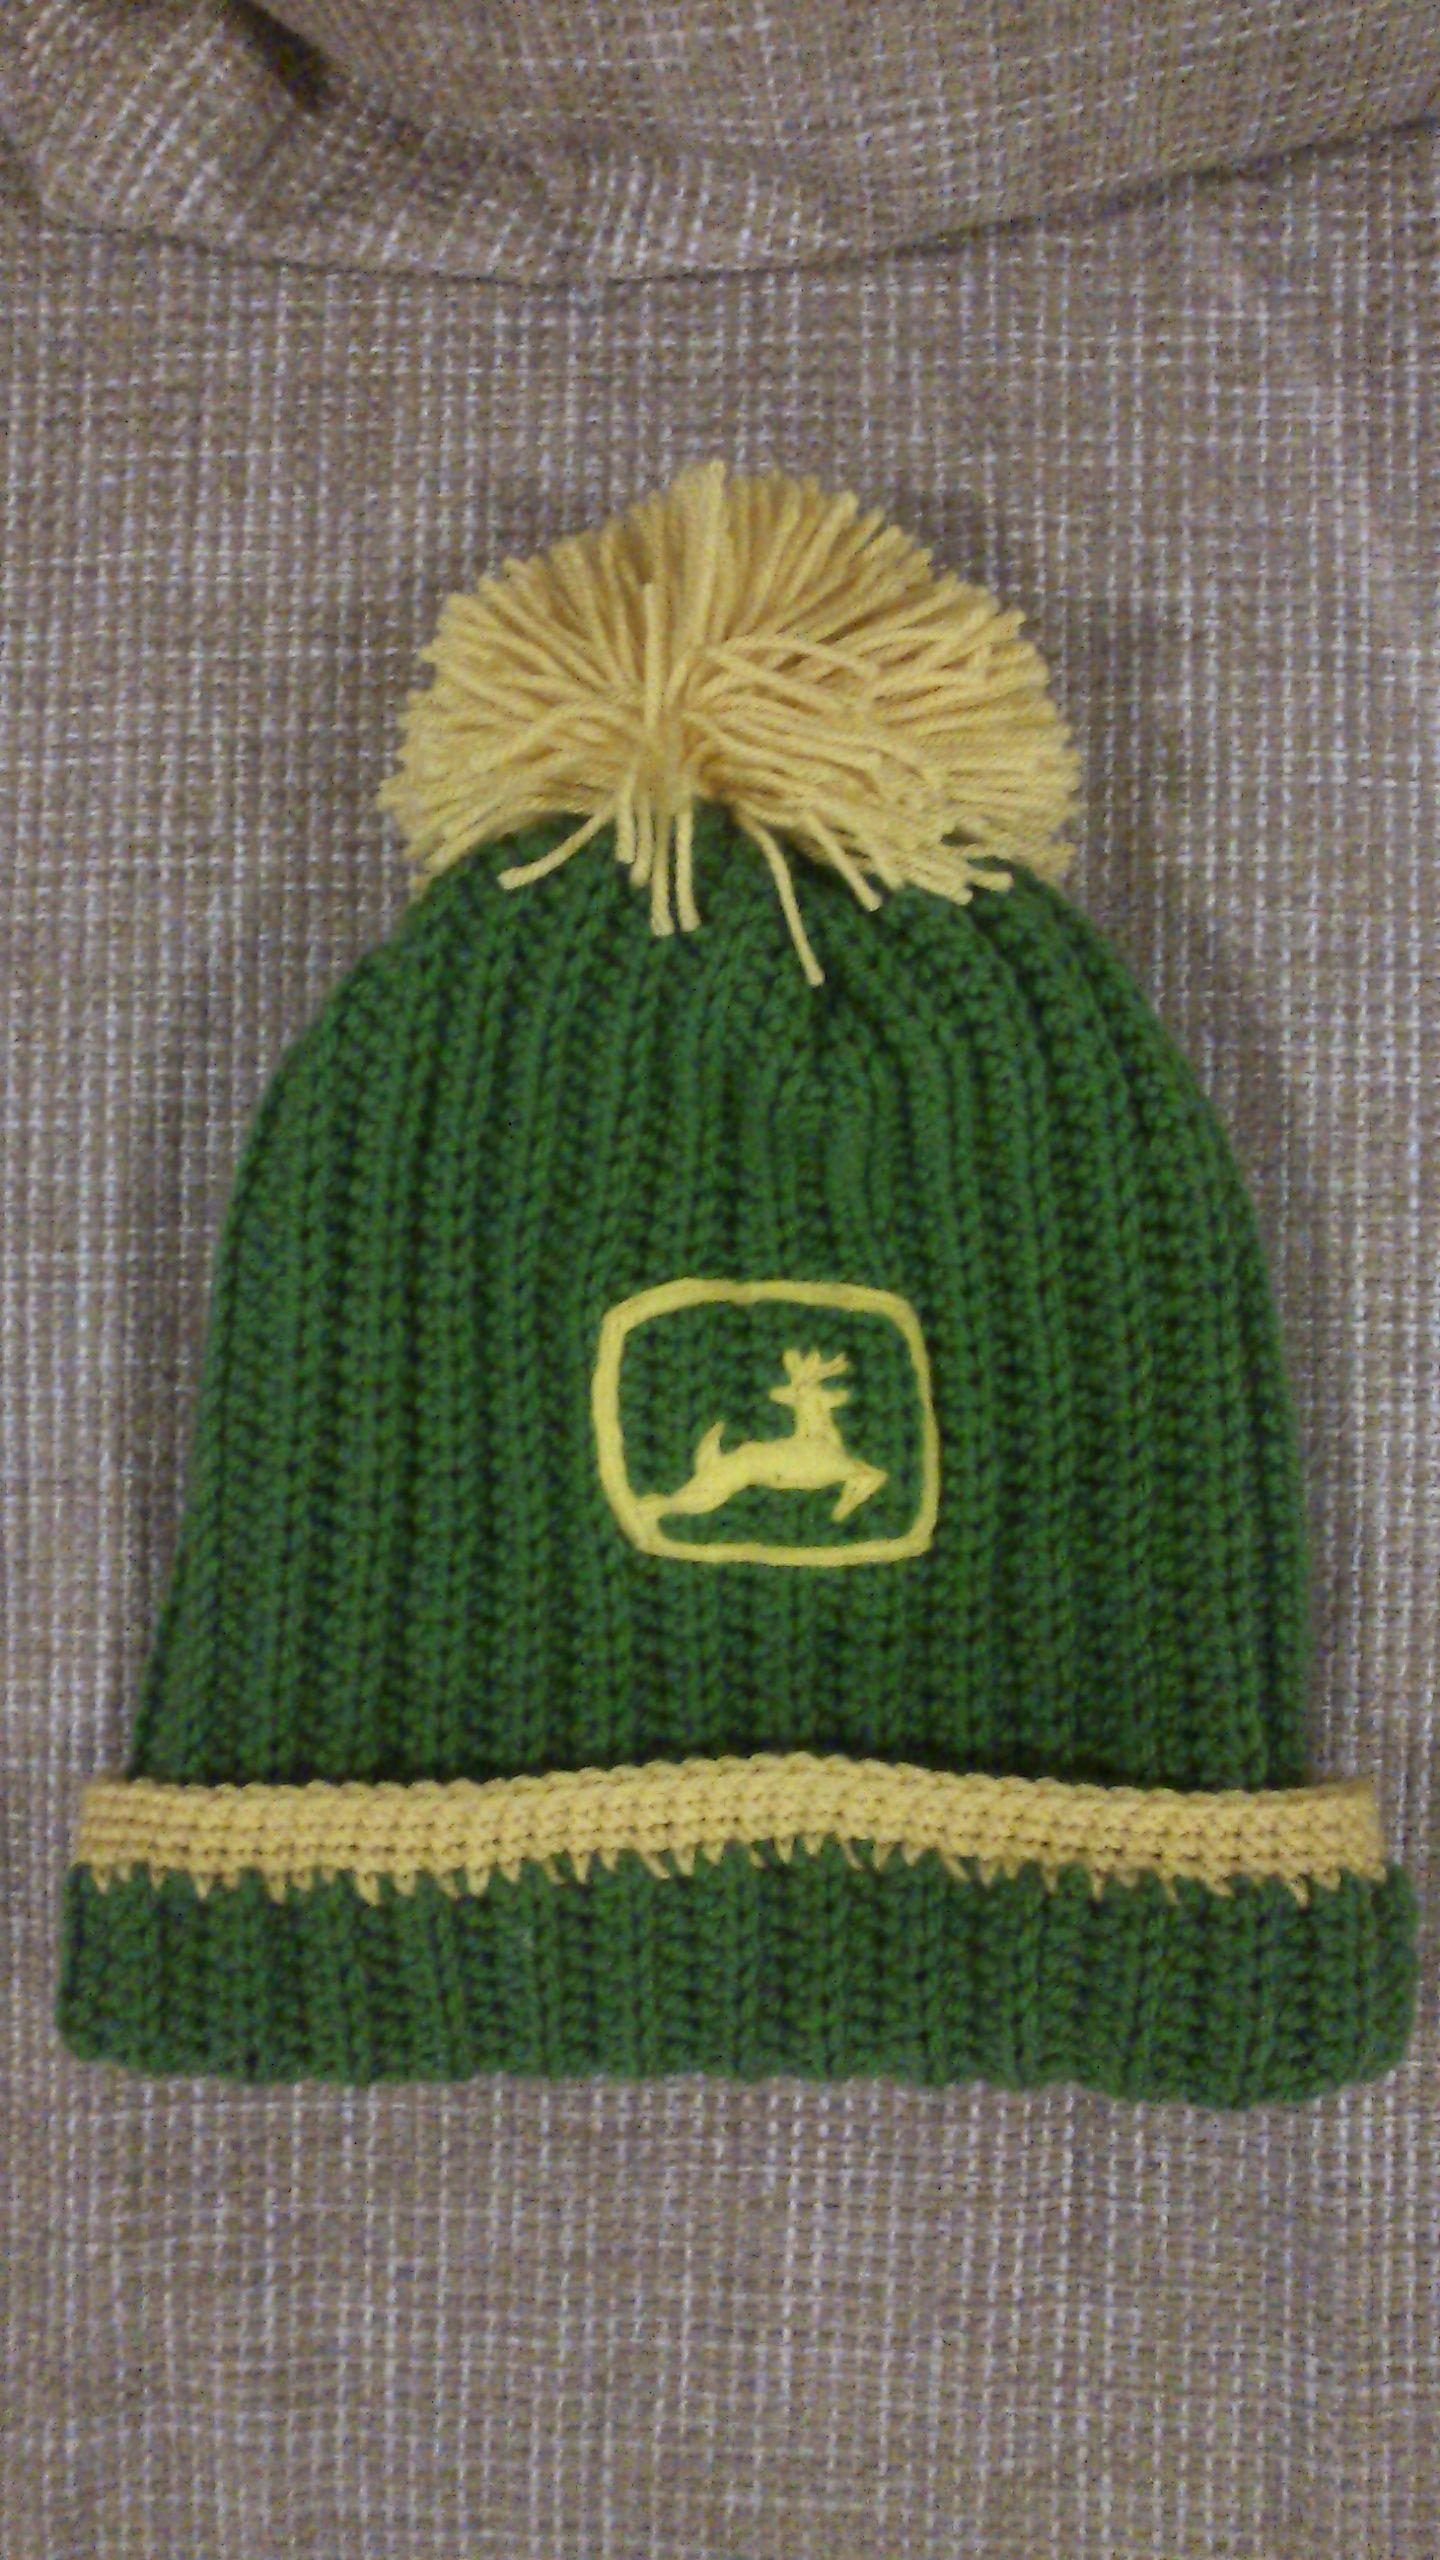 Crochet John Deere hat | My crochet | Pinterest